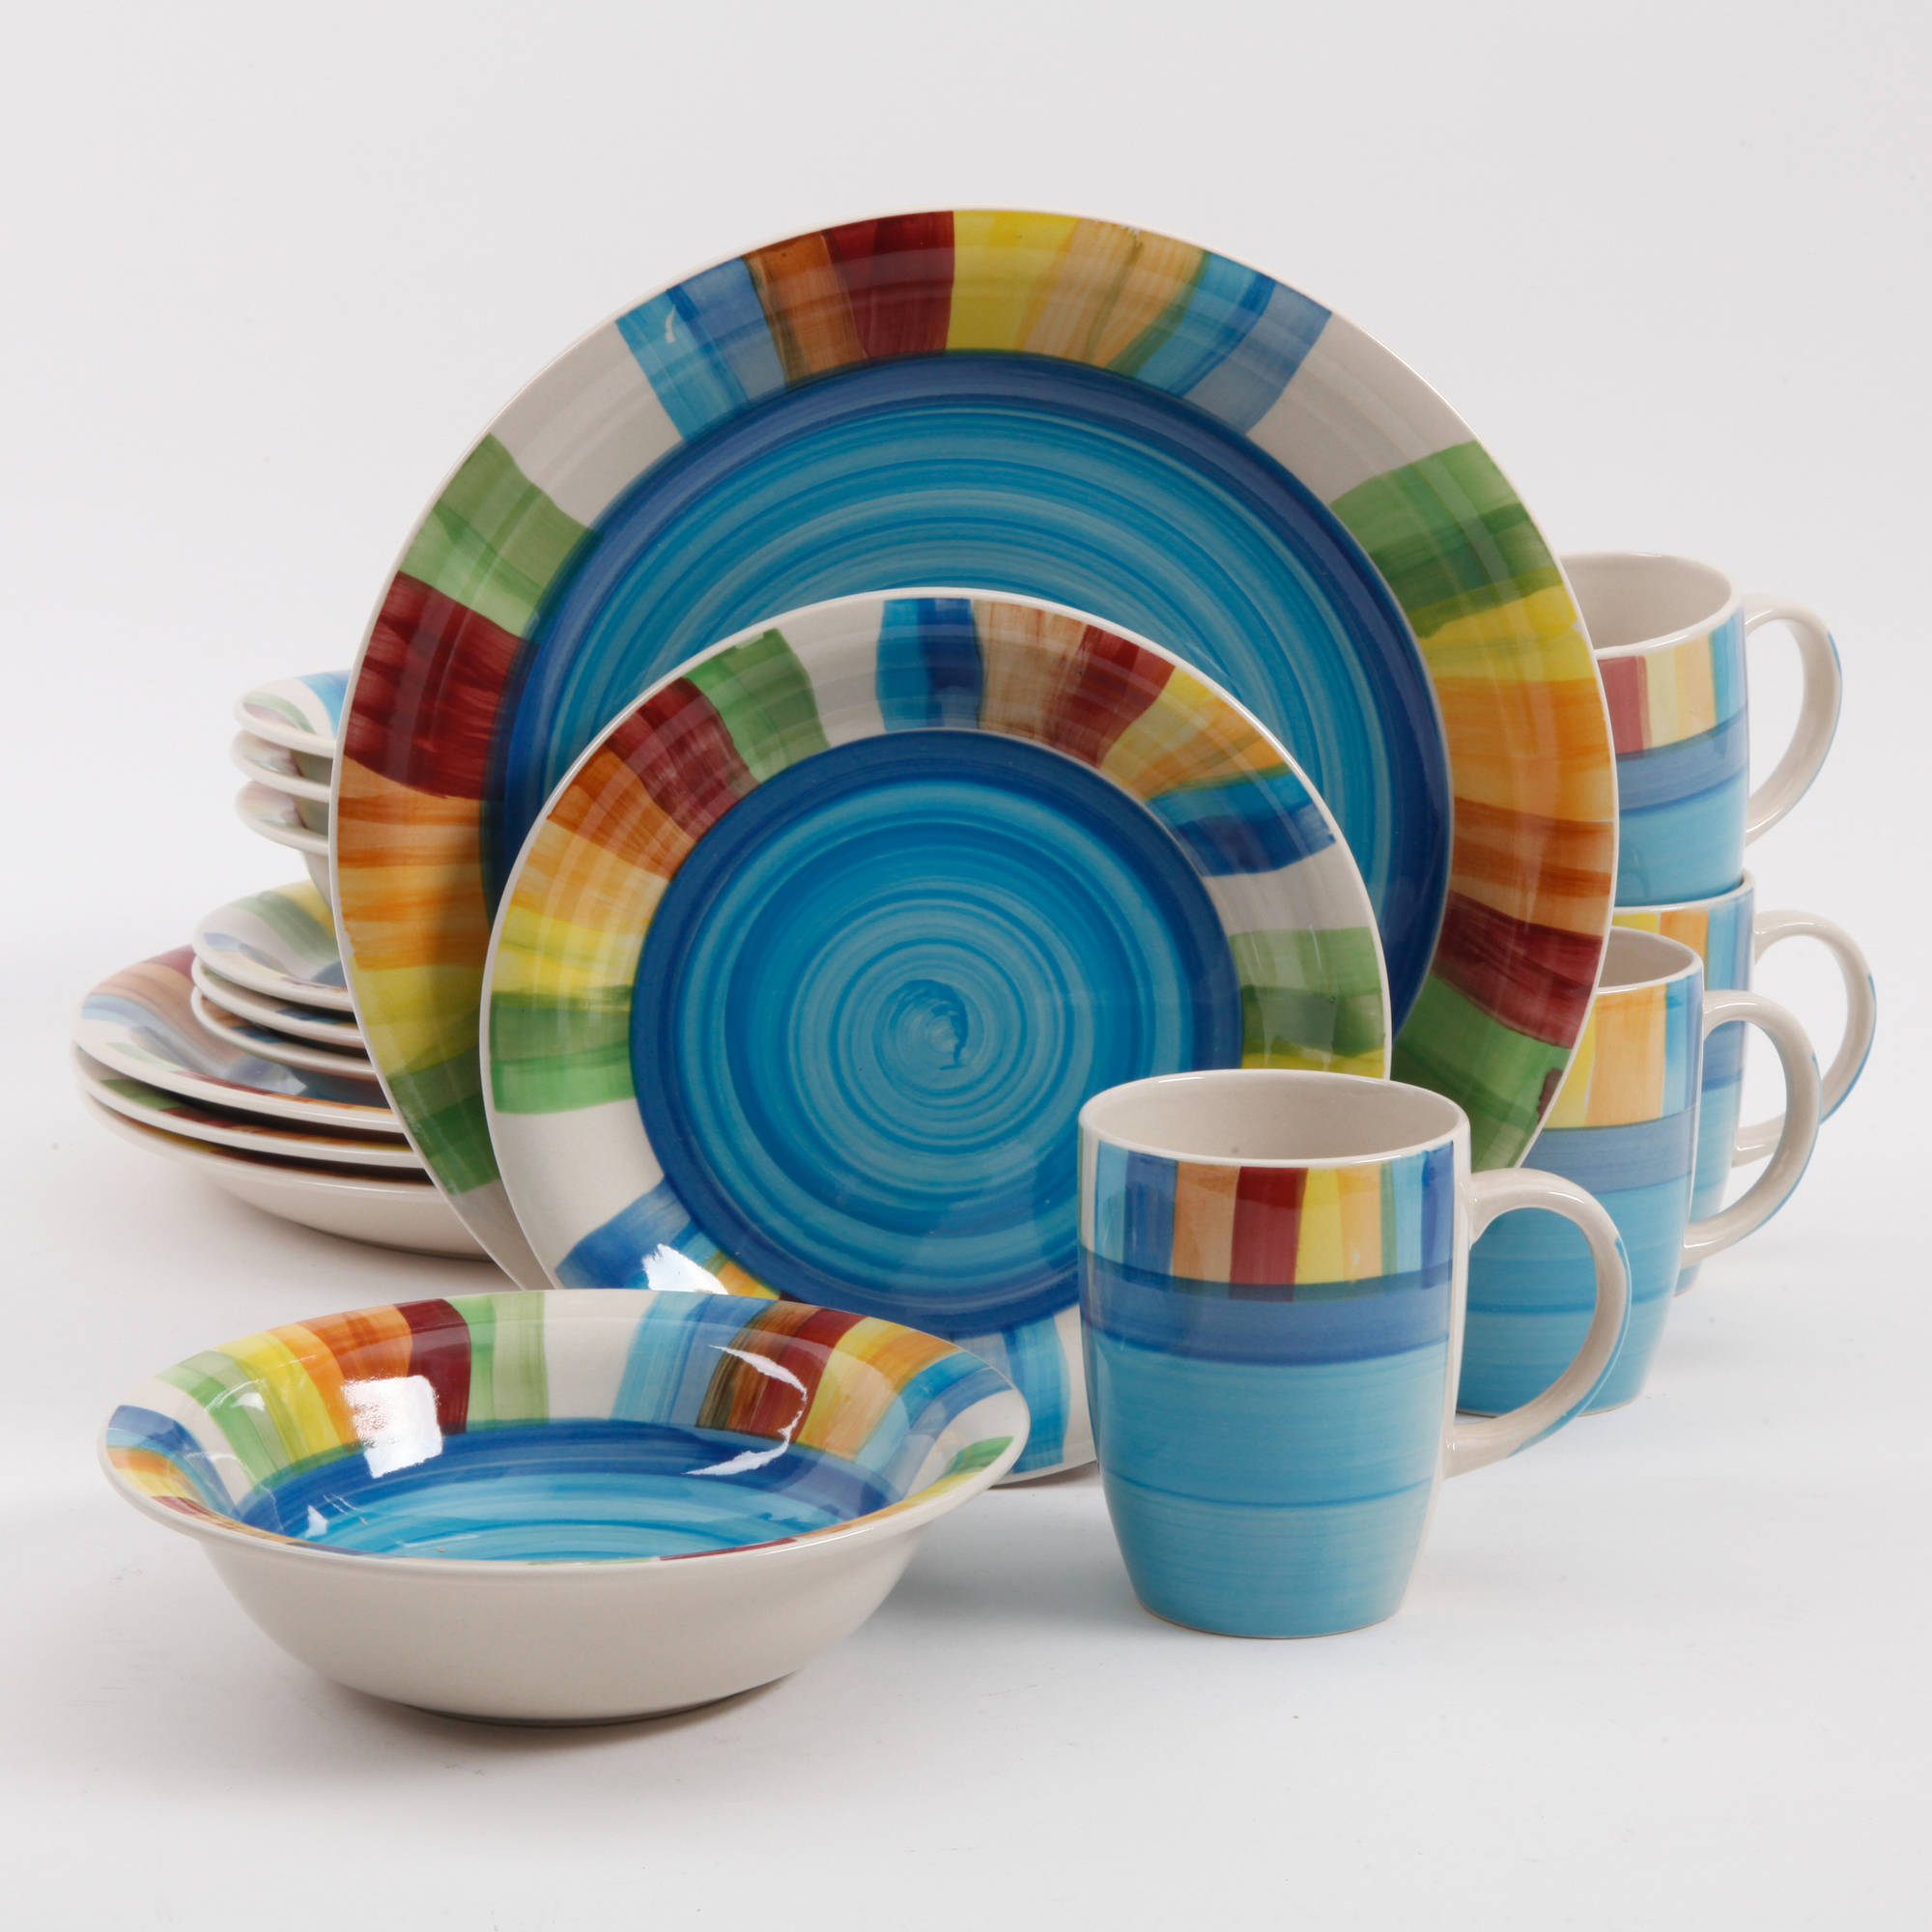 Gibson Carmelita Stripes 16-Piece Dinnerware Set